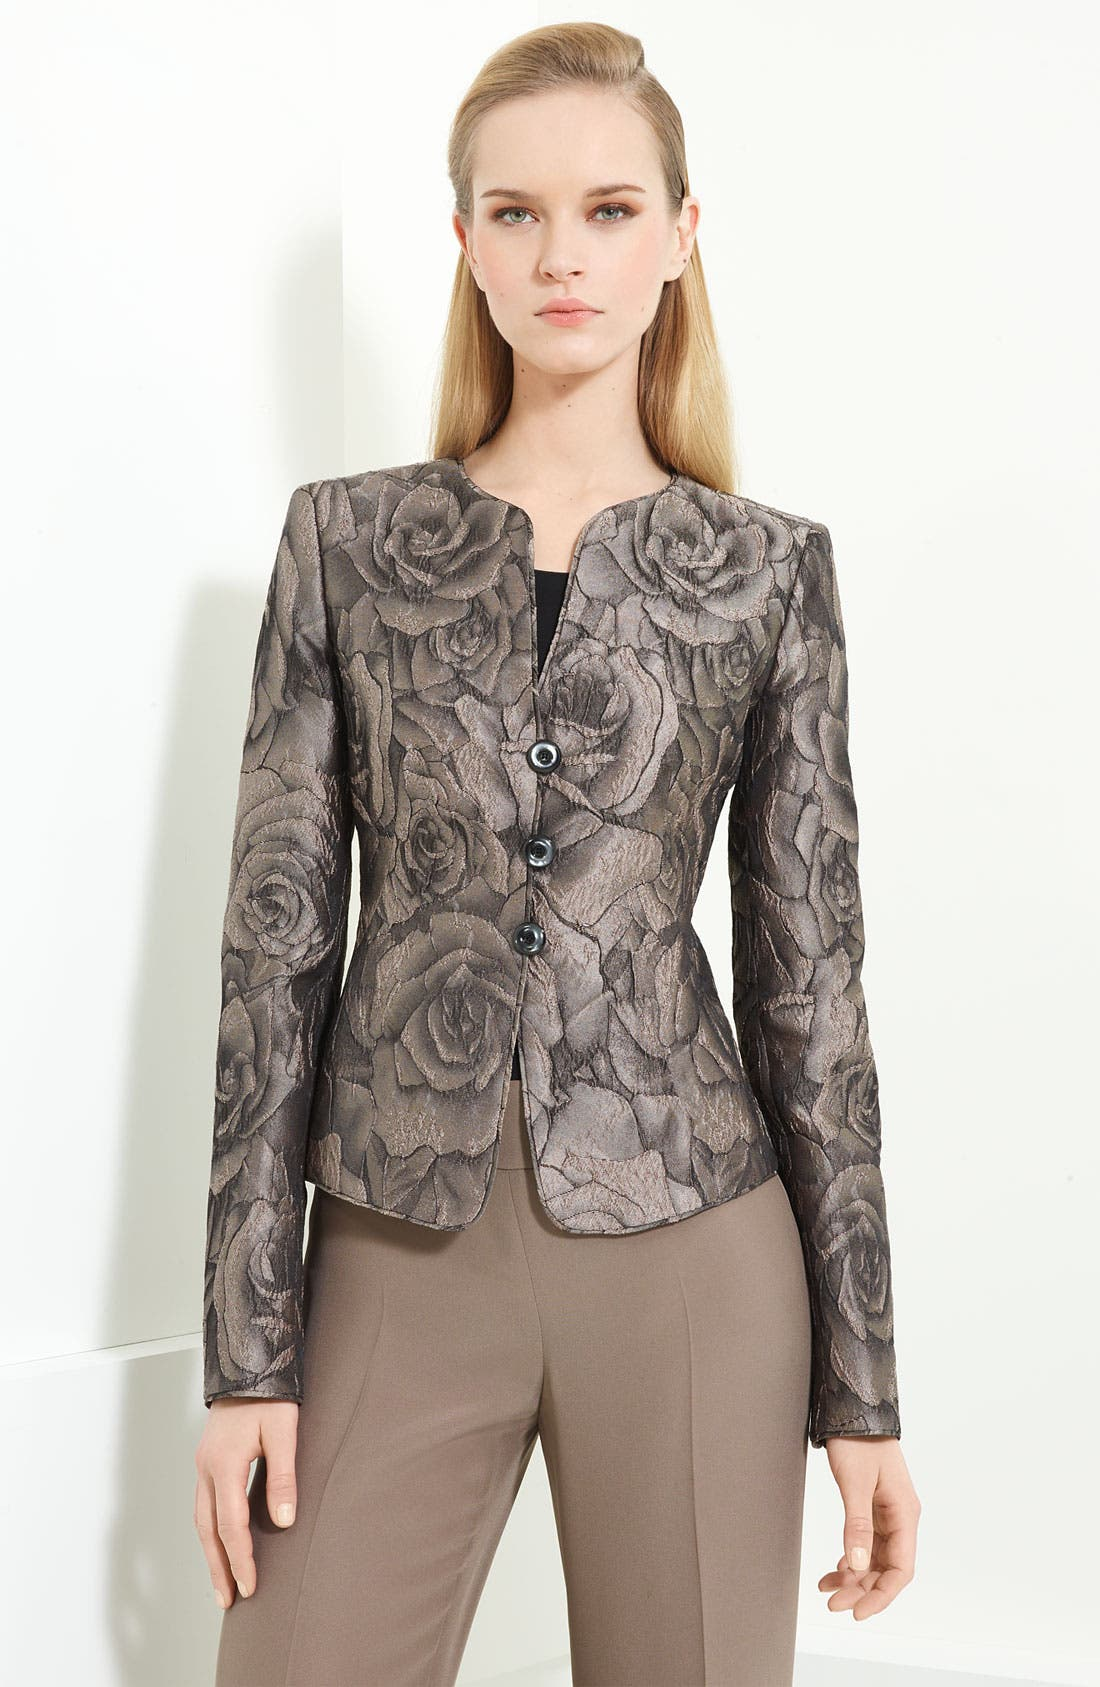 Alternate Image 1 Selected - Armani Collezioni Floral Jacquard Jacket